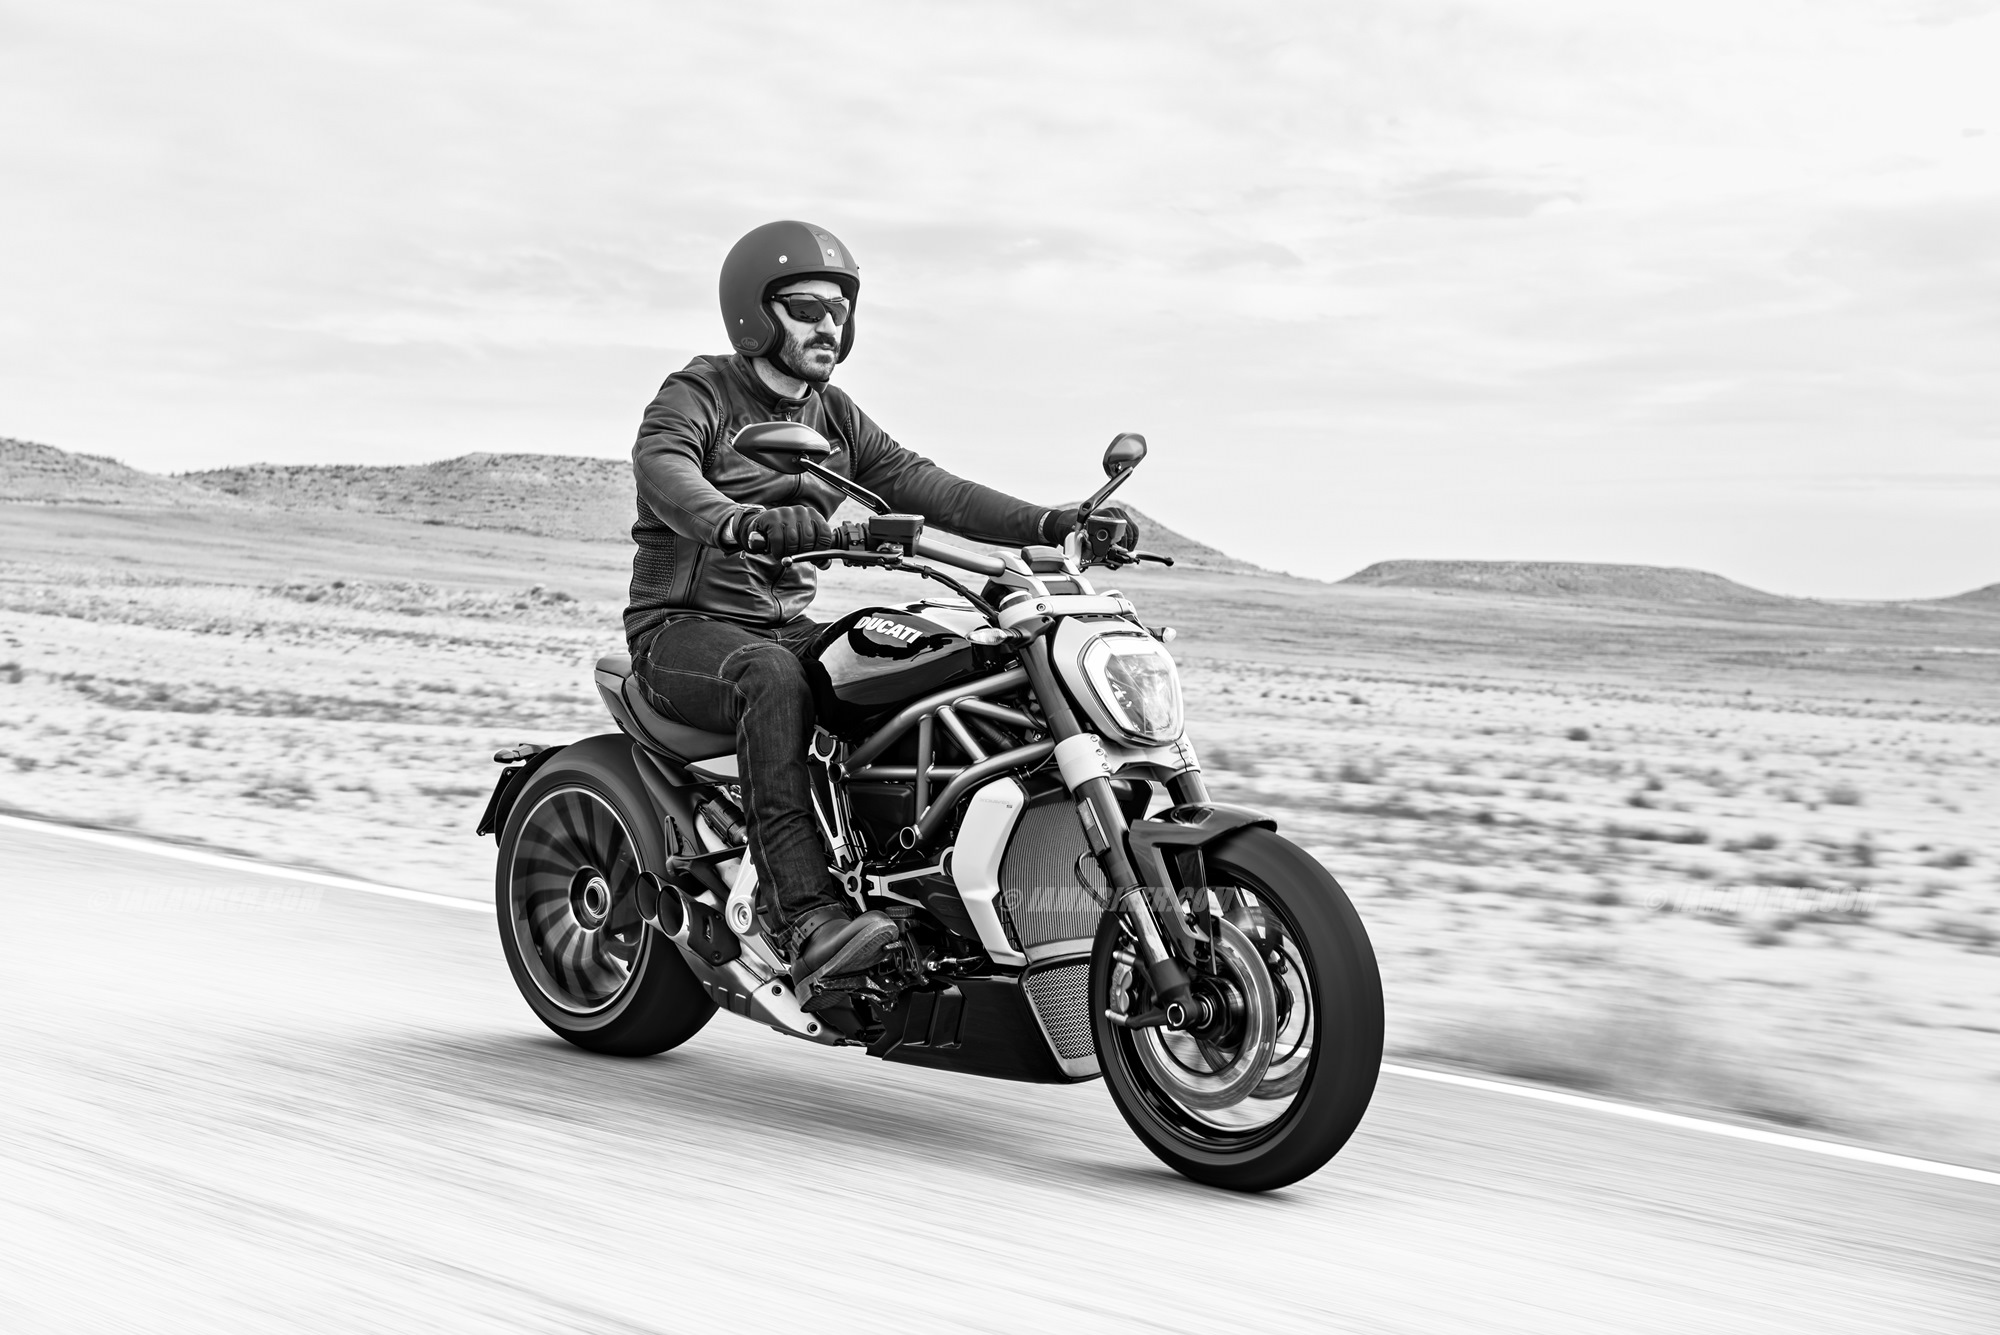 2016 Ducati XDIAVEL S action